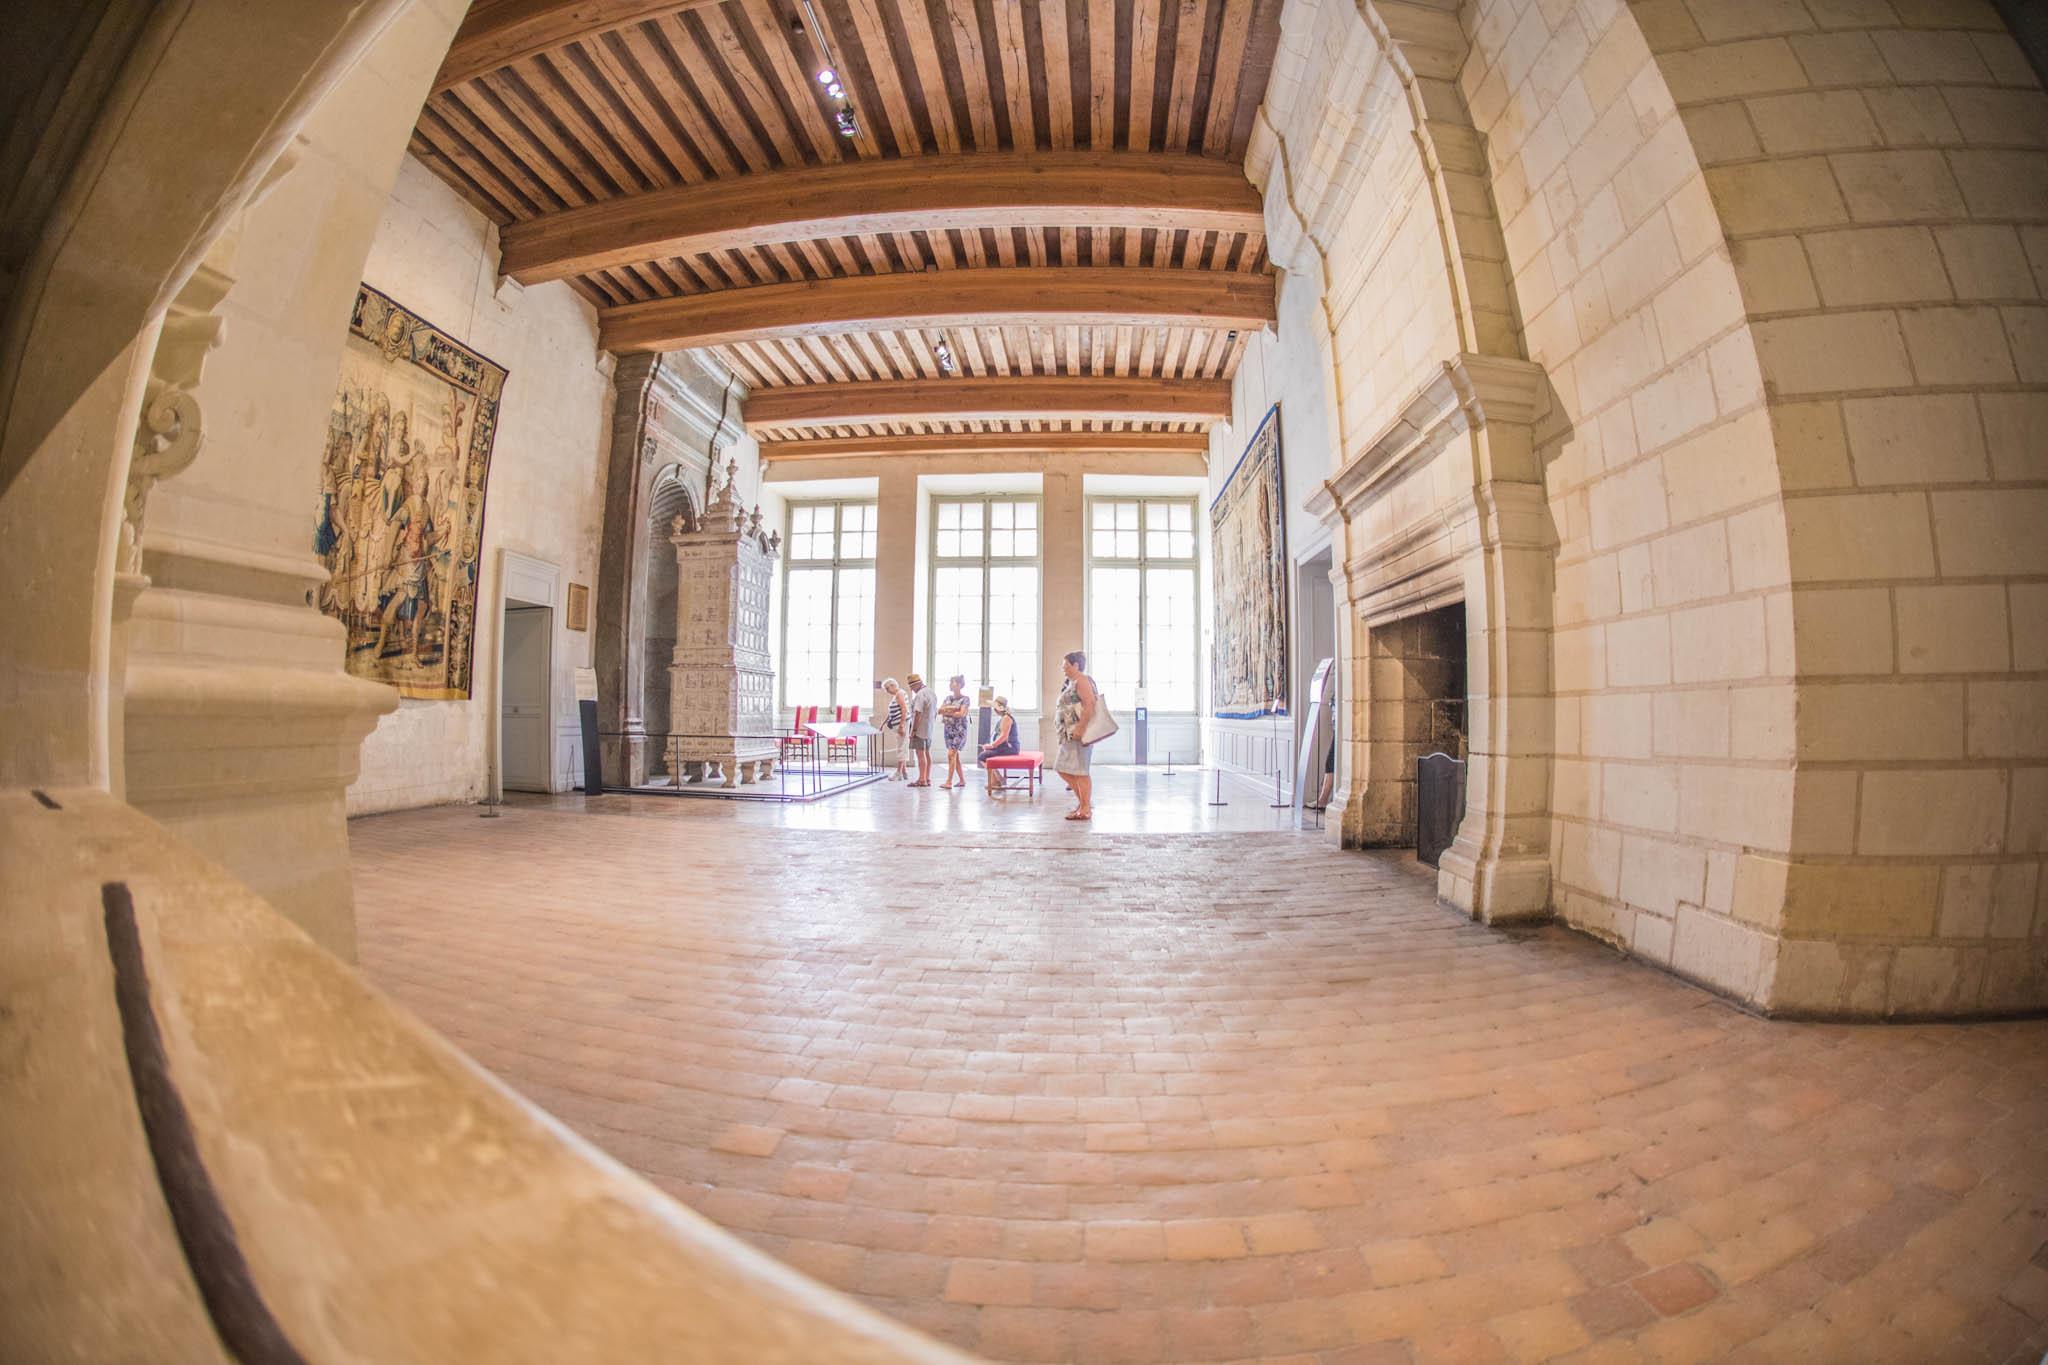 Chambord Chateau (Castle) - 2017 (49 of 66)